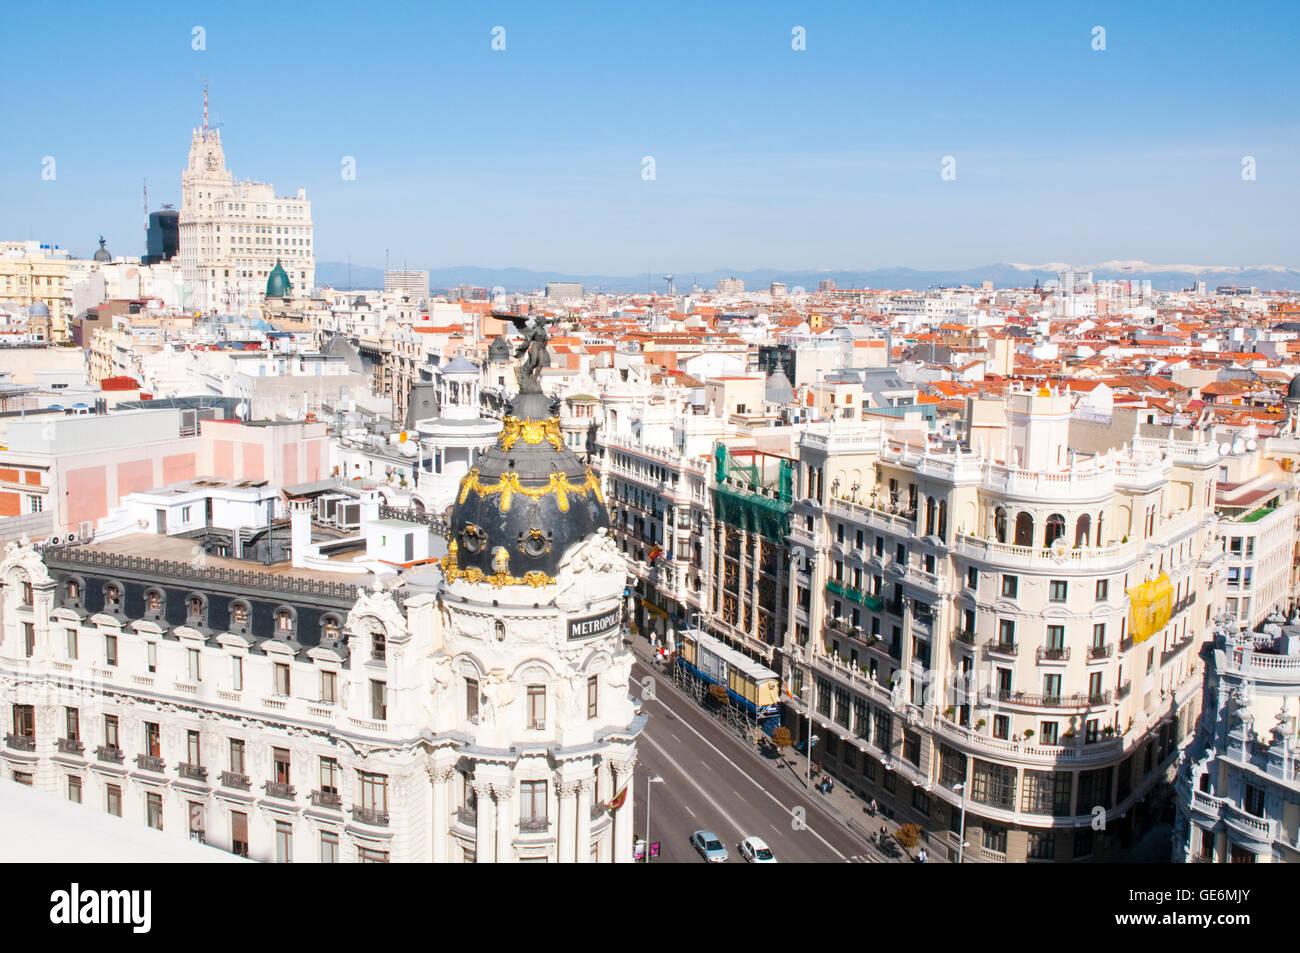 Gran Via street from the terrace of Circulo de Bellas Artes. Madrid, Spain. Stock Photo